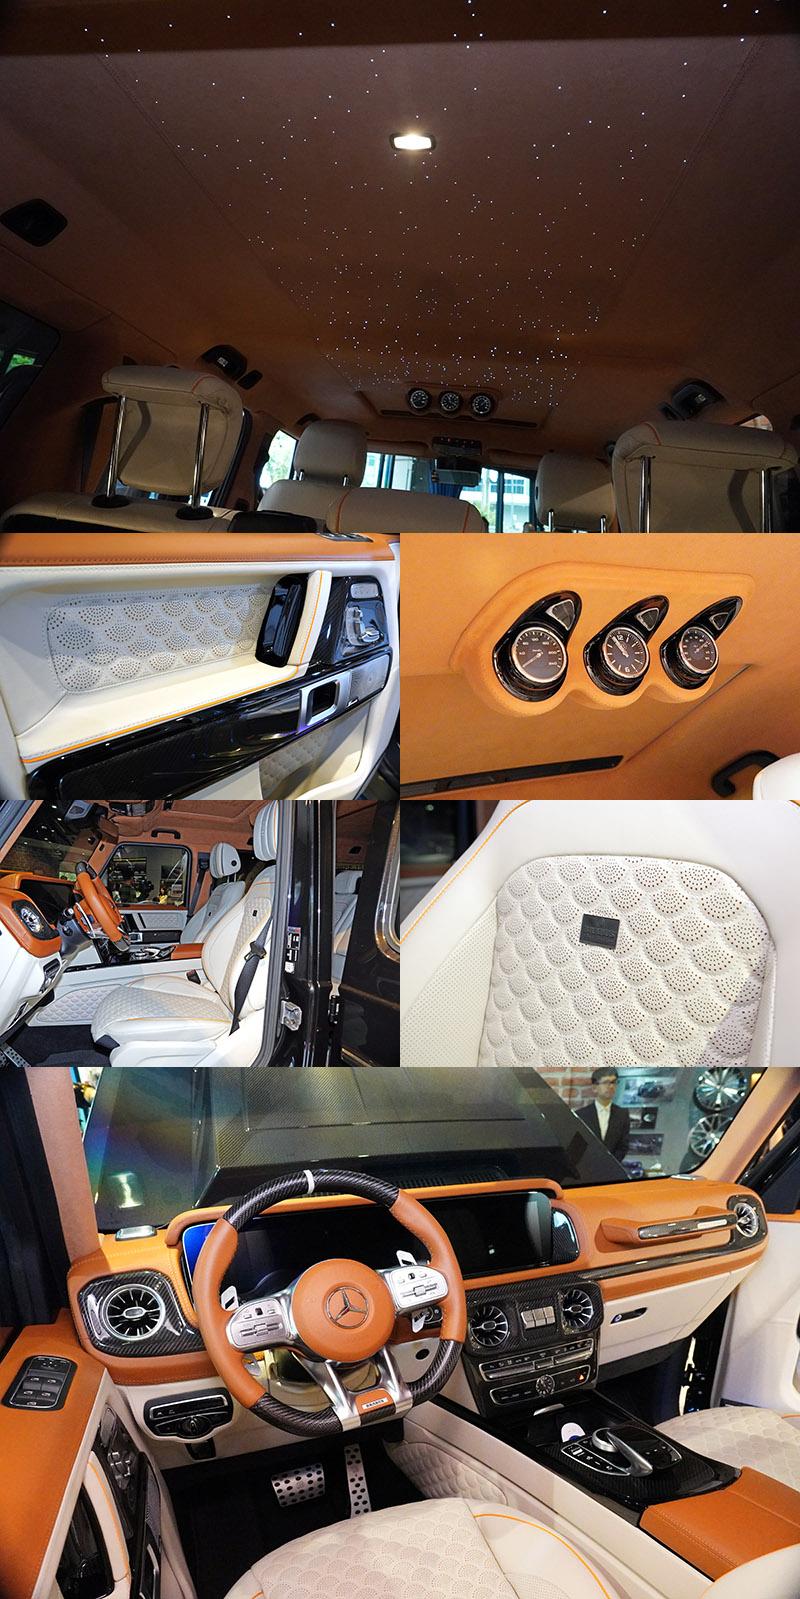 BRABUS提供高度客製化服務,每位車主皆可搭配出最喜愛的內裝氛圍。